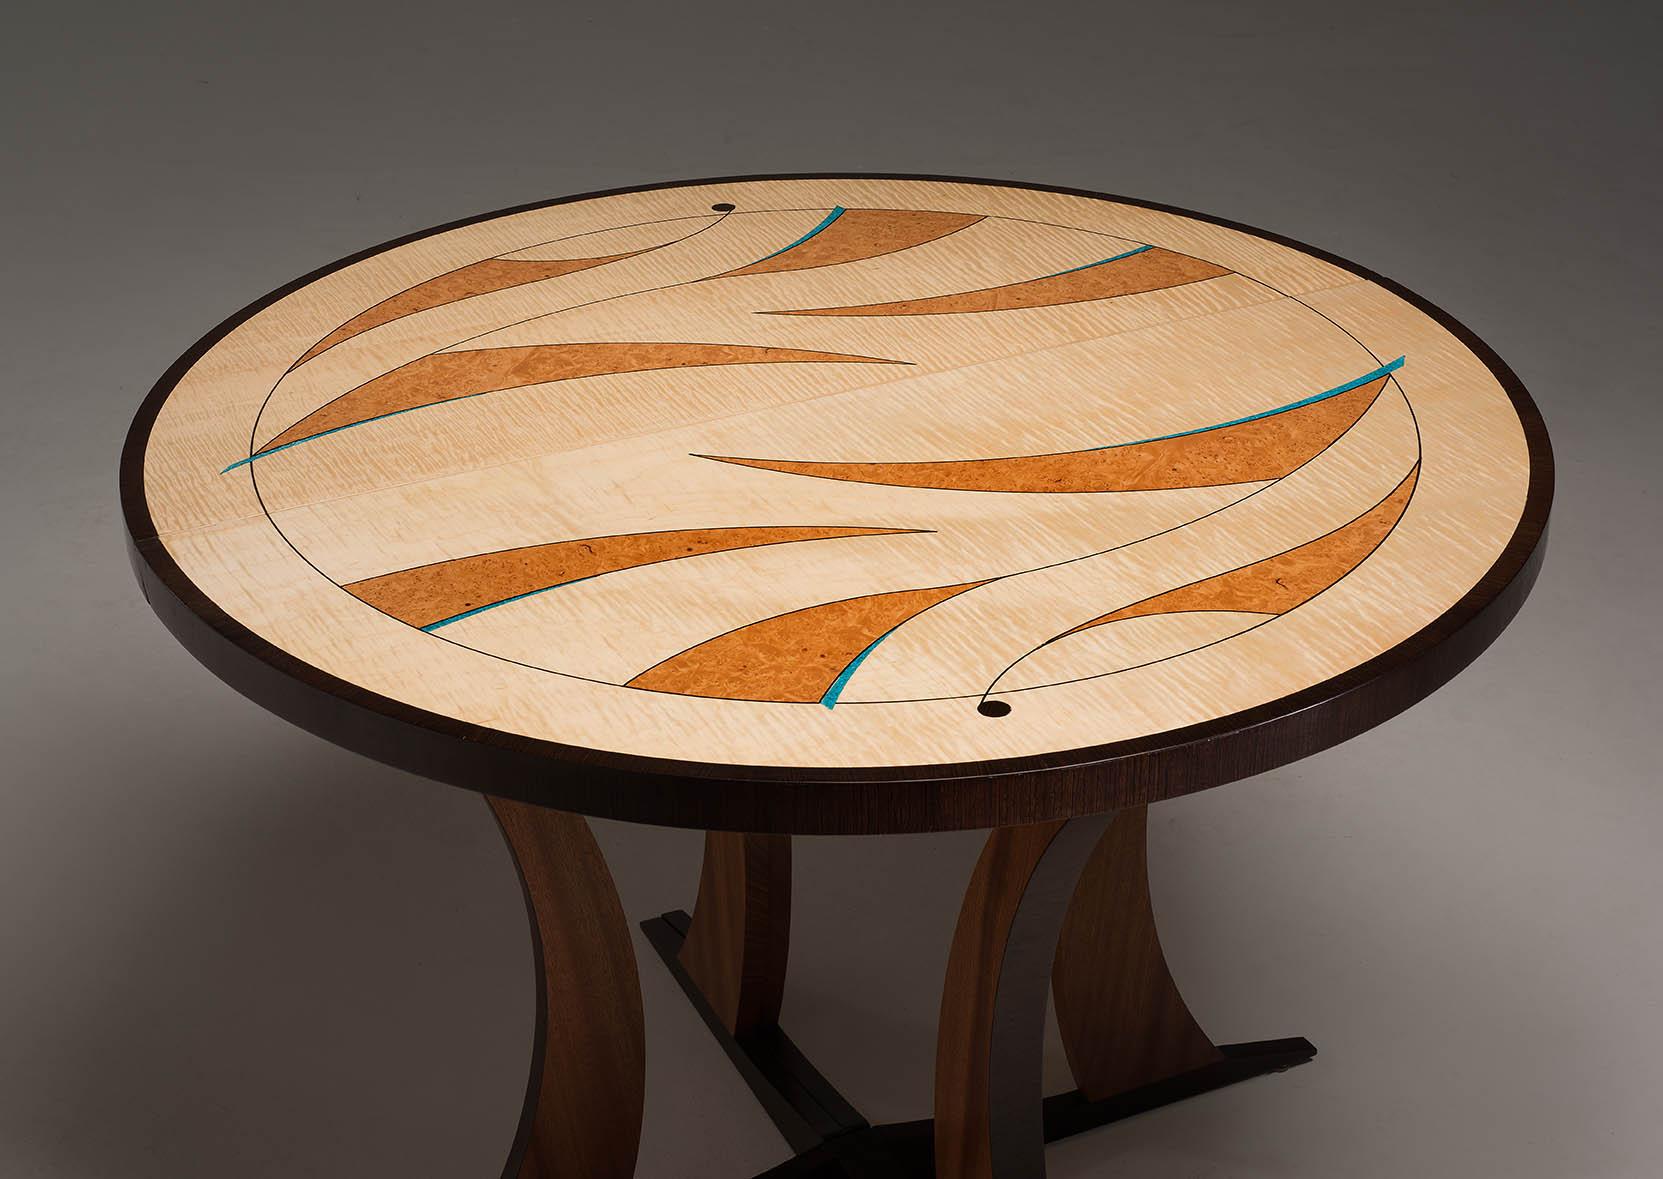 tuck-table-16-sm.jpg